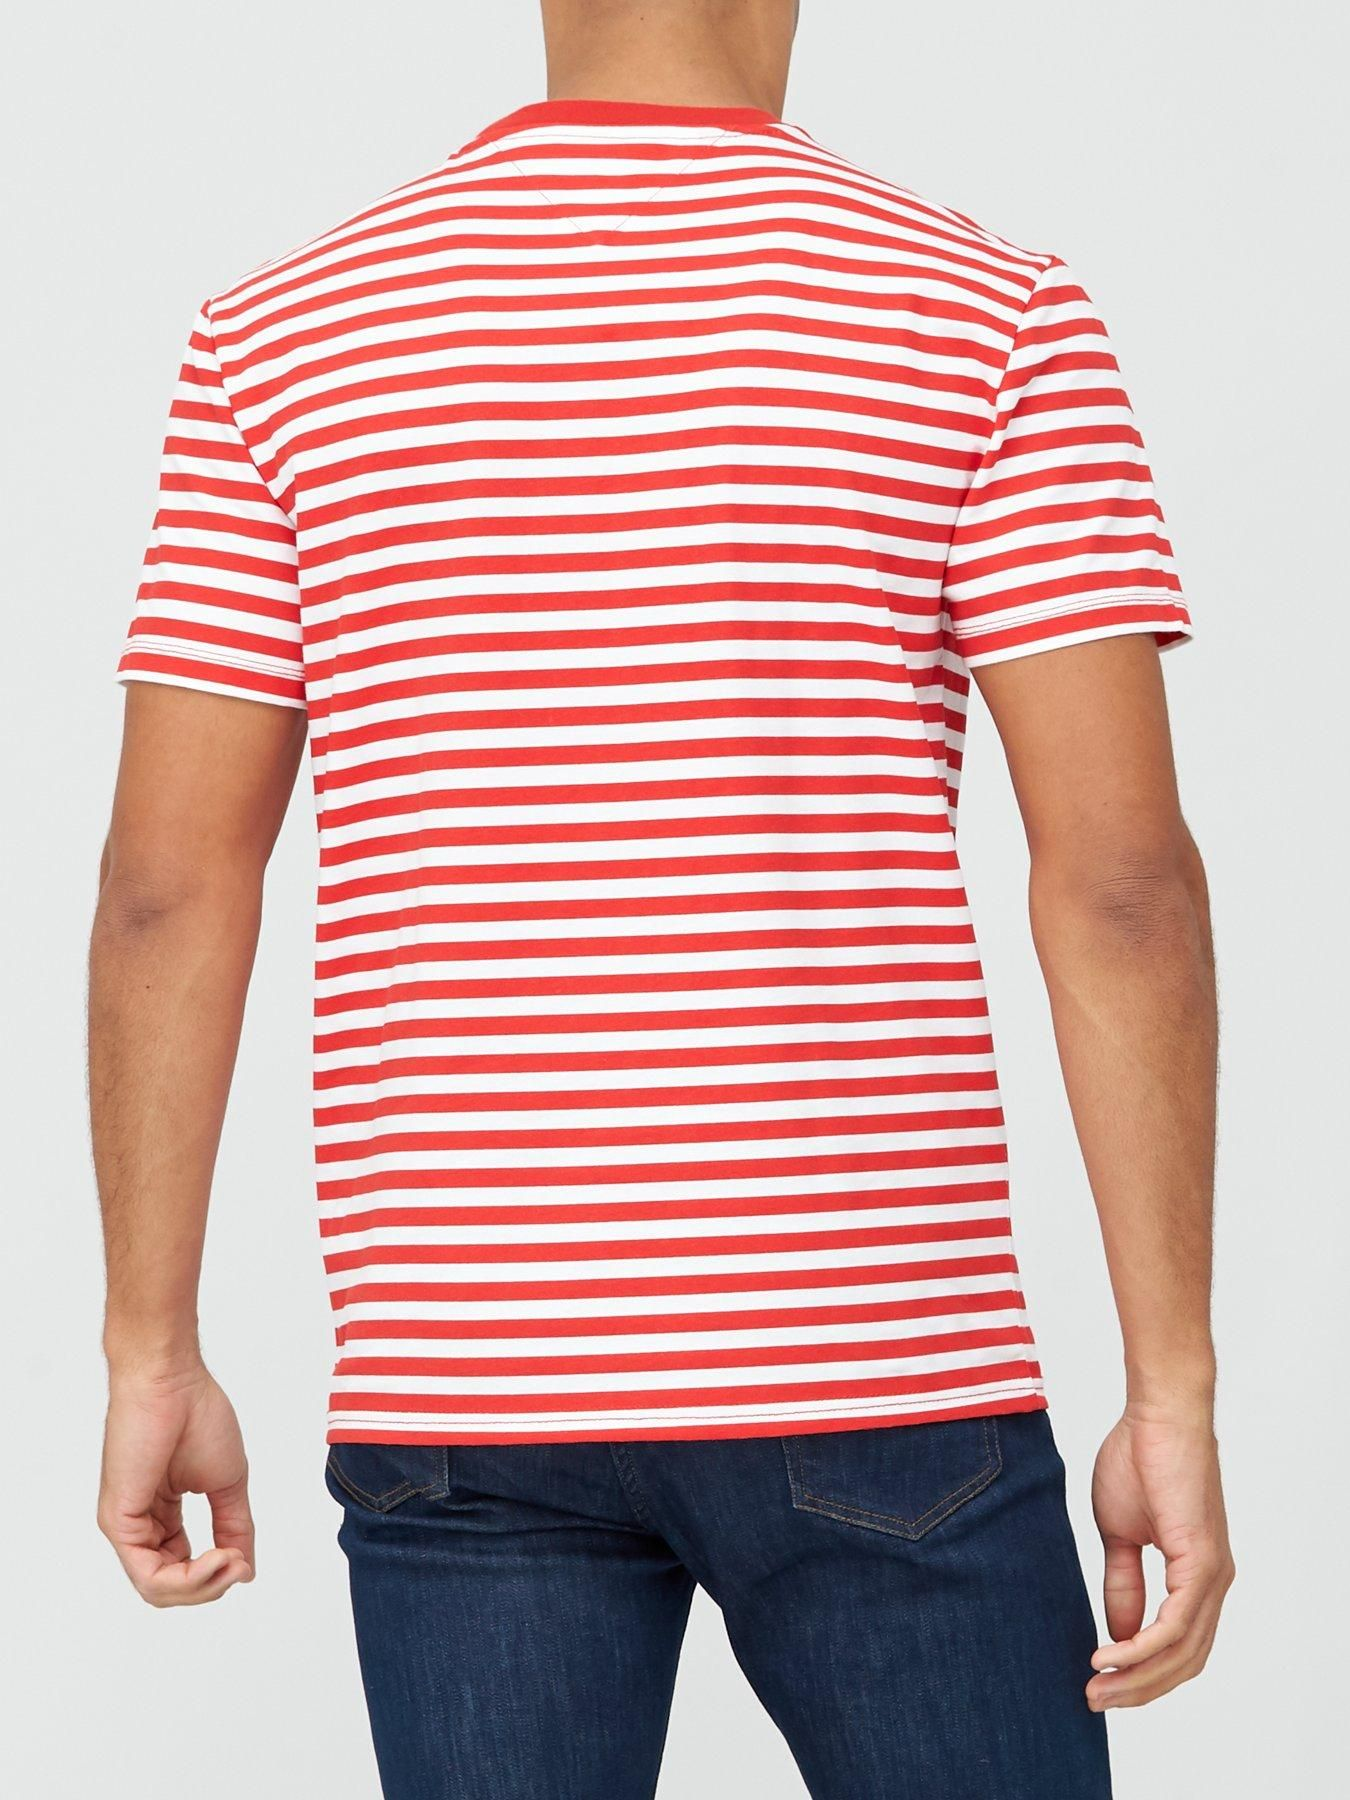 Red Tommy Jeans Men/'s Branded Stripe T-Shirt